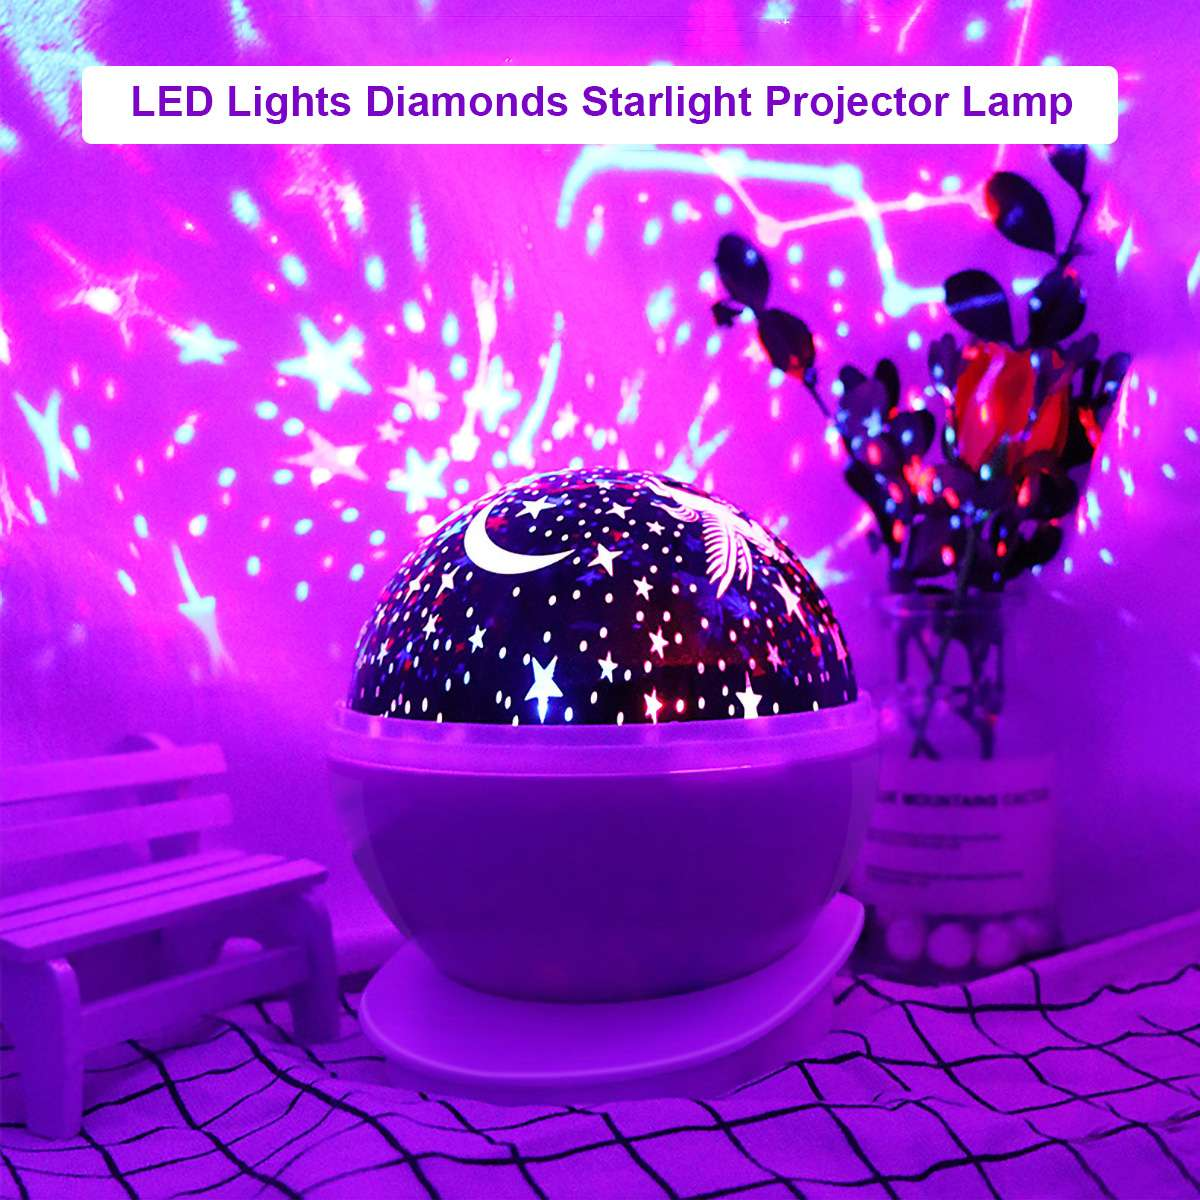 LED Night Light Automatic Rotating Star Sky Projection Lights Stars Moon Colorful LED Lights Diamonds Starlight Projector Lamp